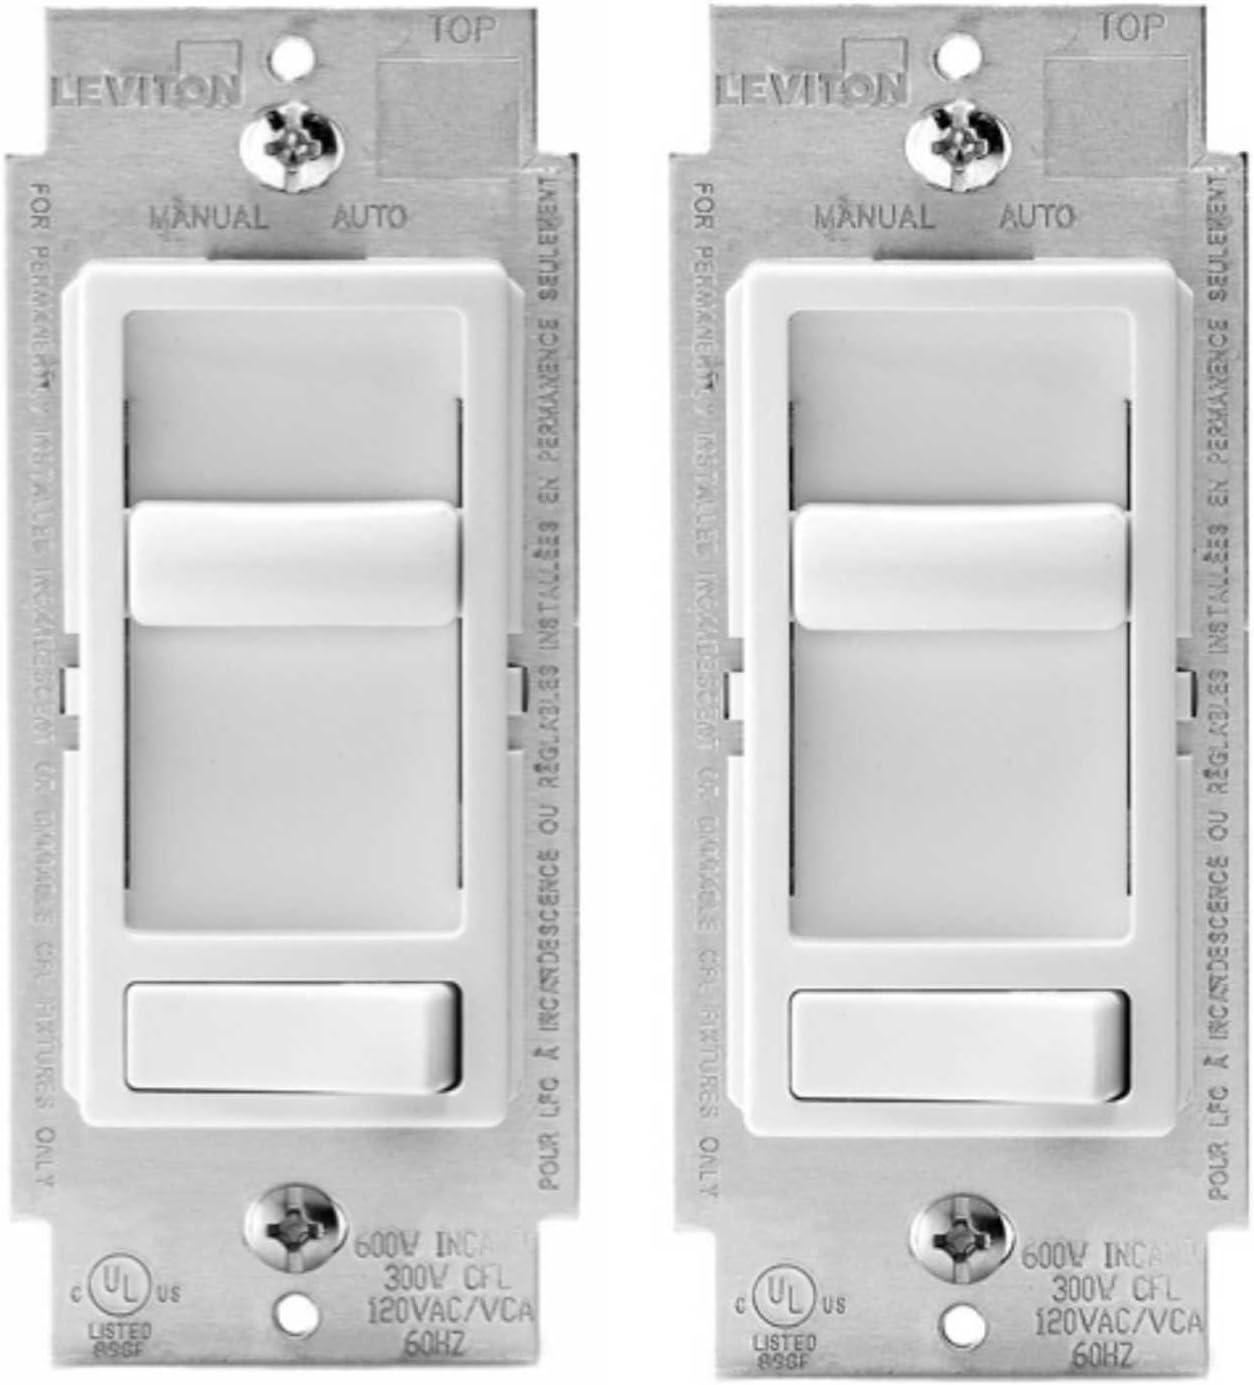 Leviton 6674-P0W SureSlide Universal 150-Watt LED and CFL/600-Watt Incandescent Dimmer, White (2 Pack) - -